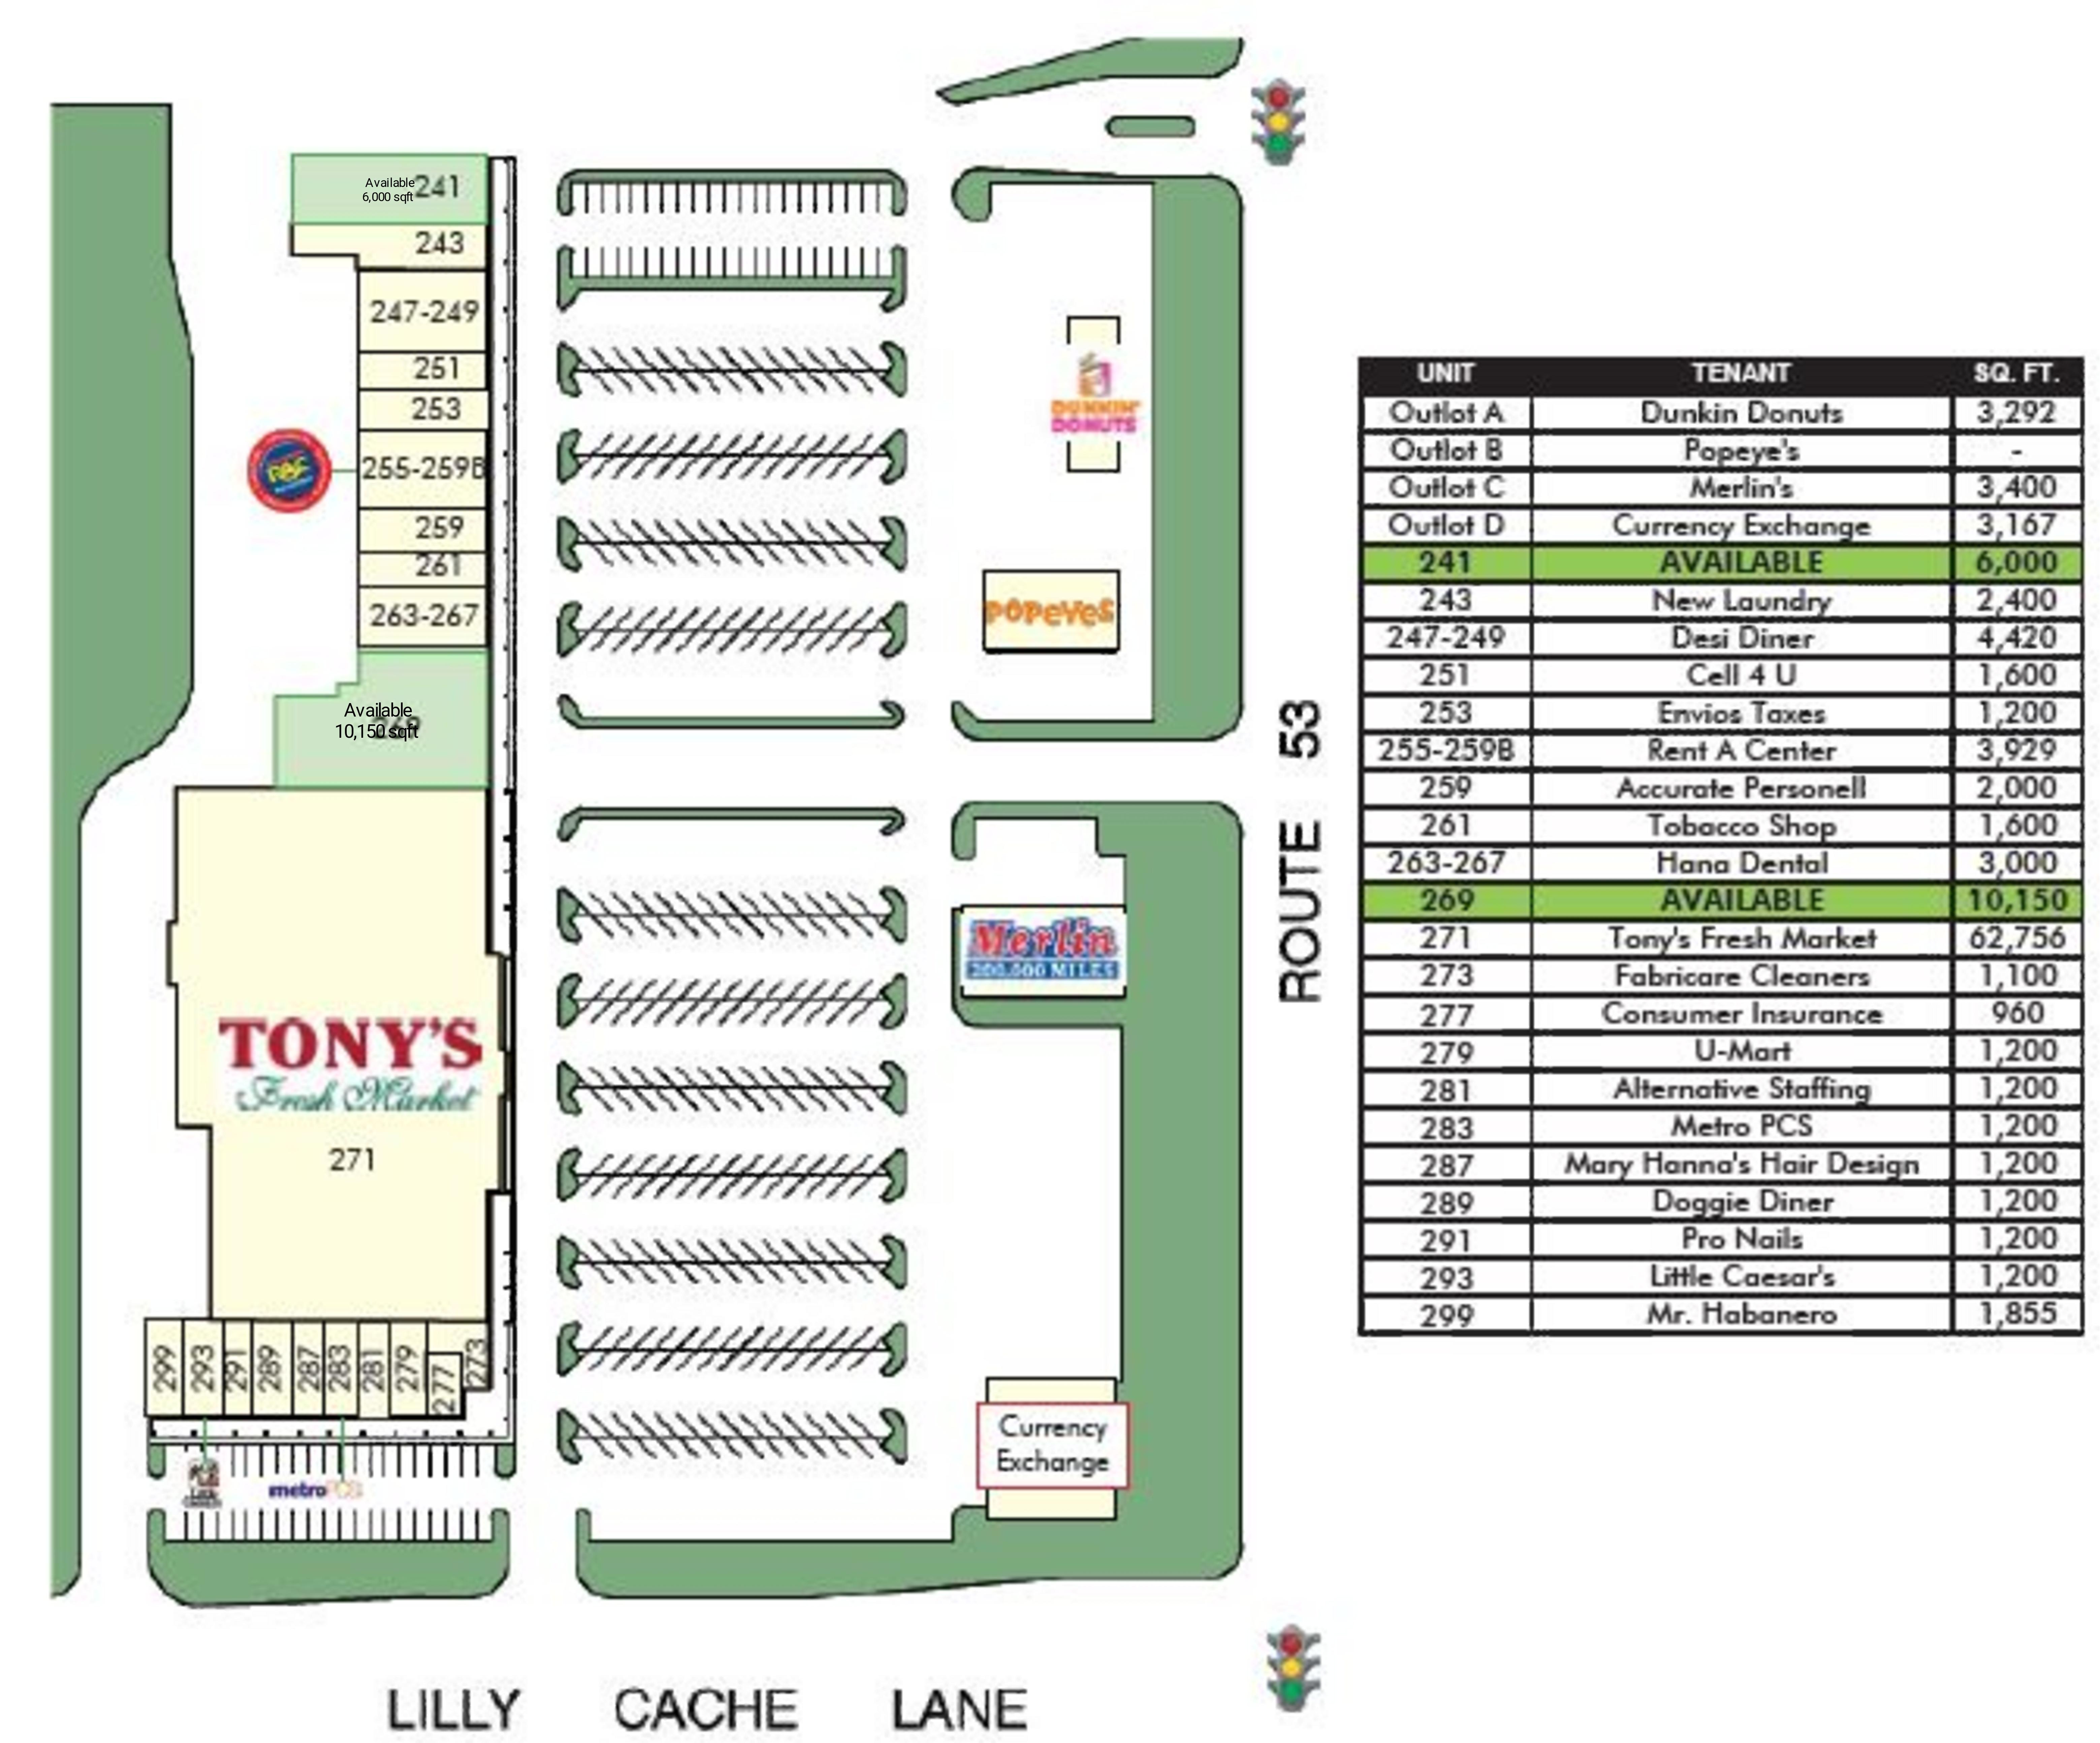 Pheasant Hill Plaza: site plan